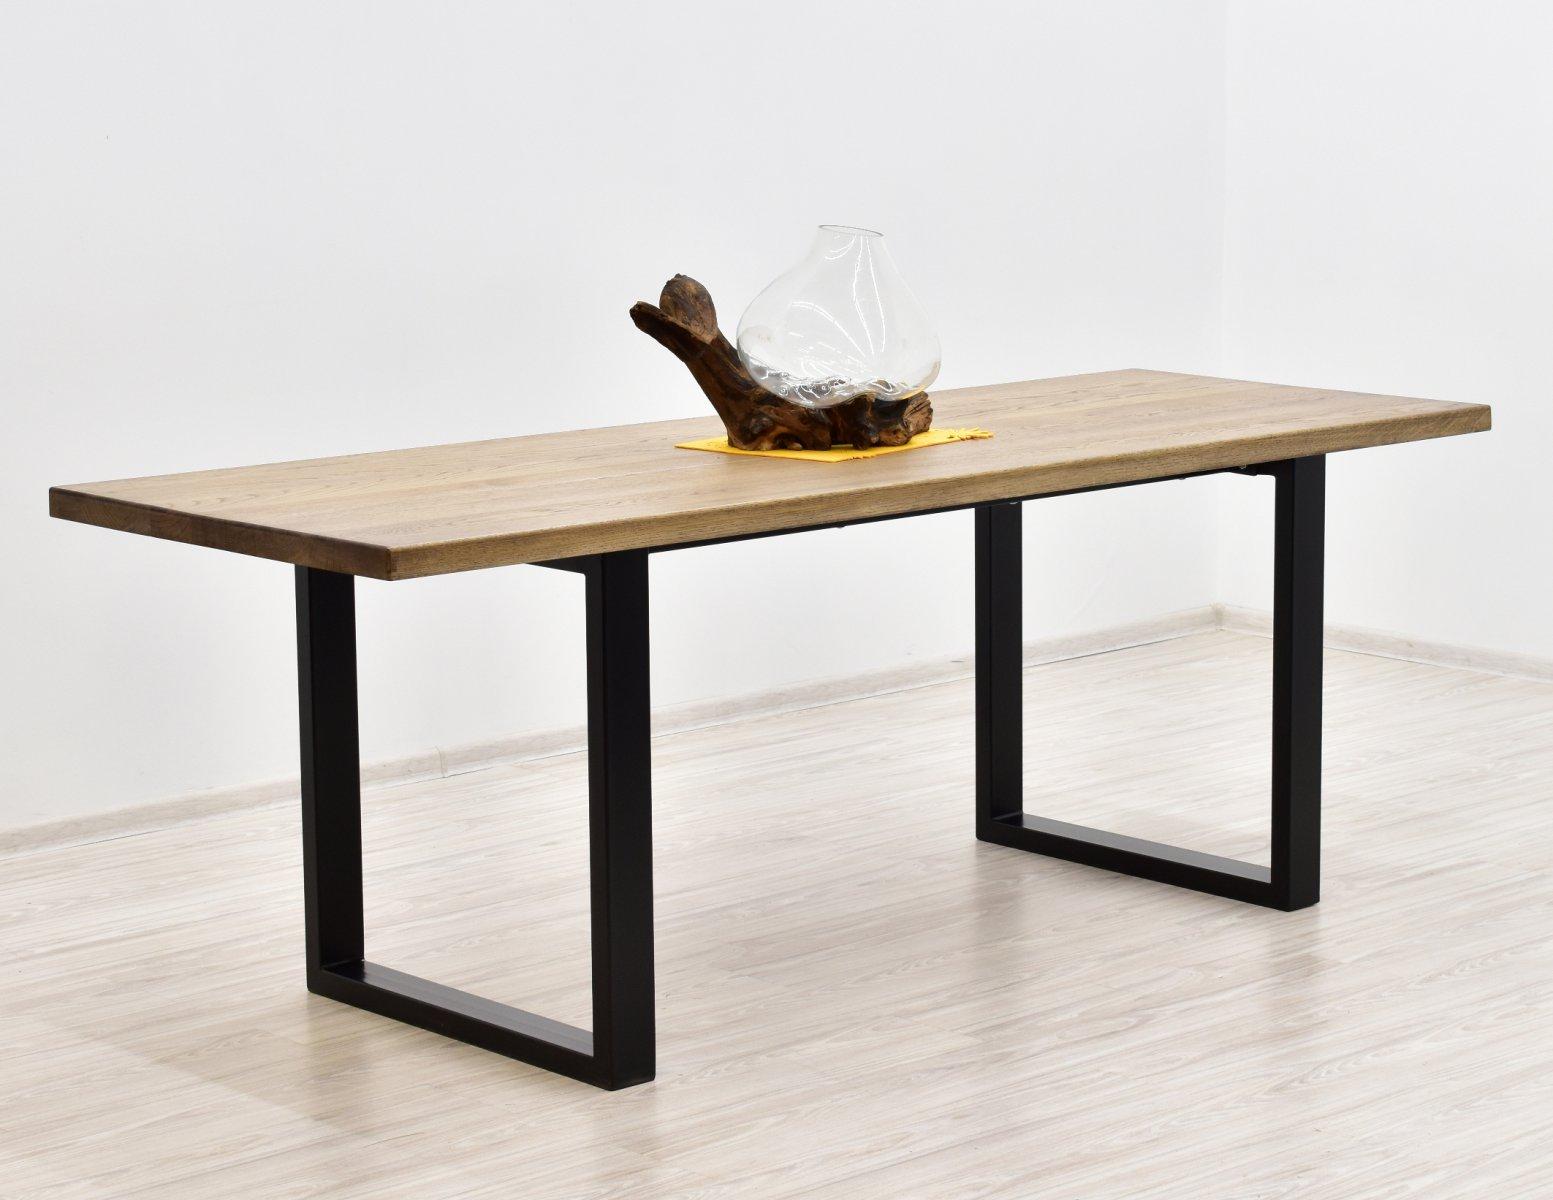 Stol nogi metal blat lite drewno dab loft (1)